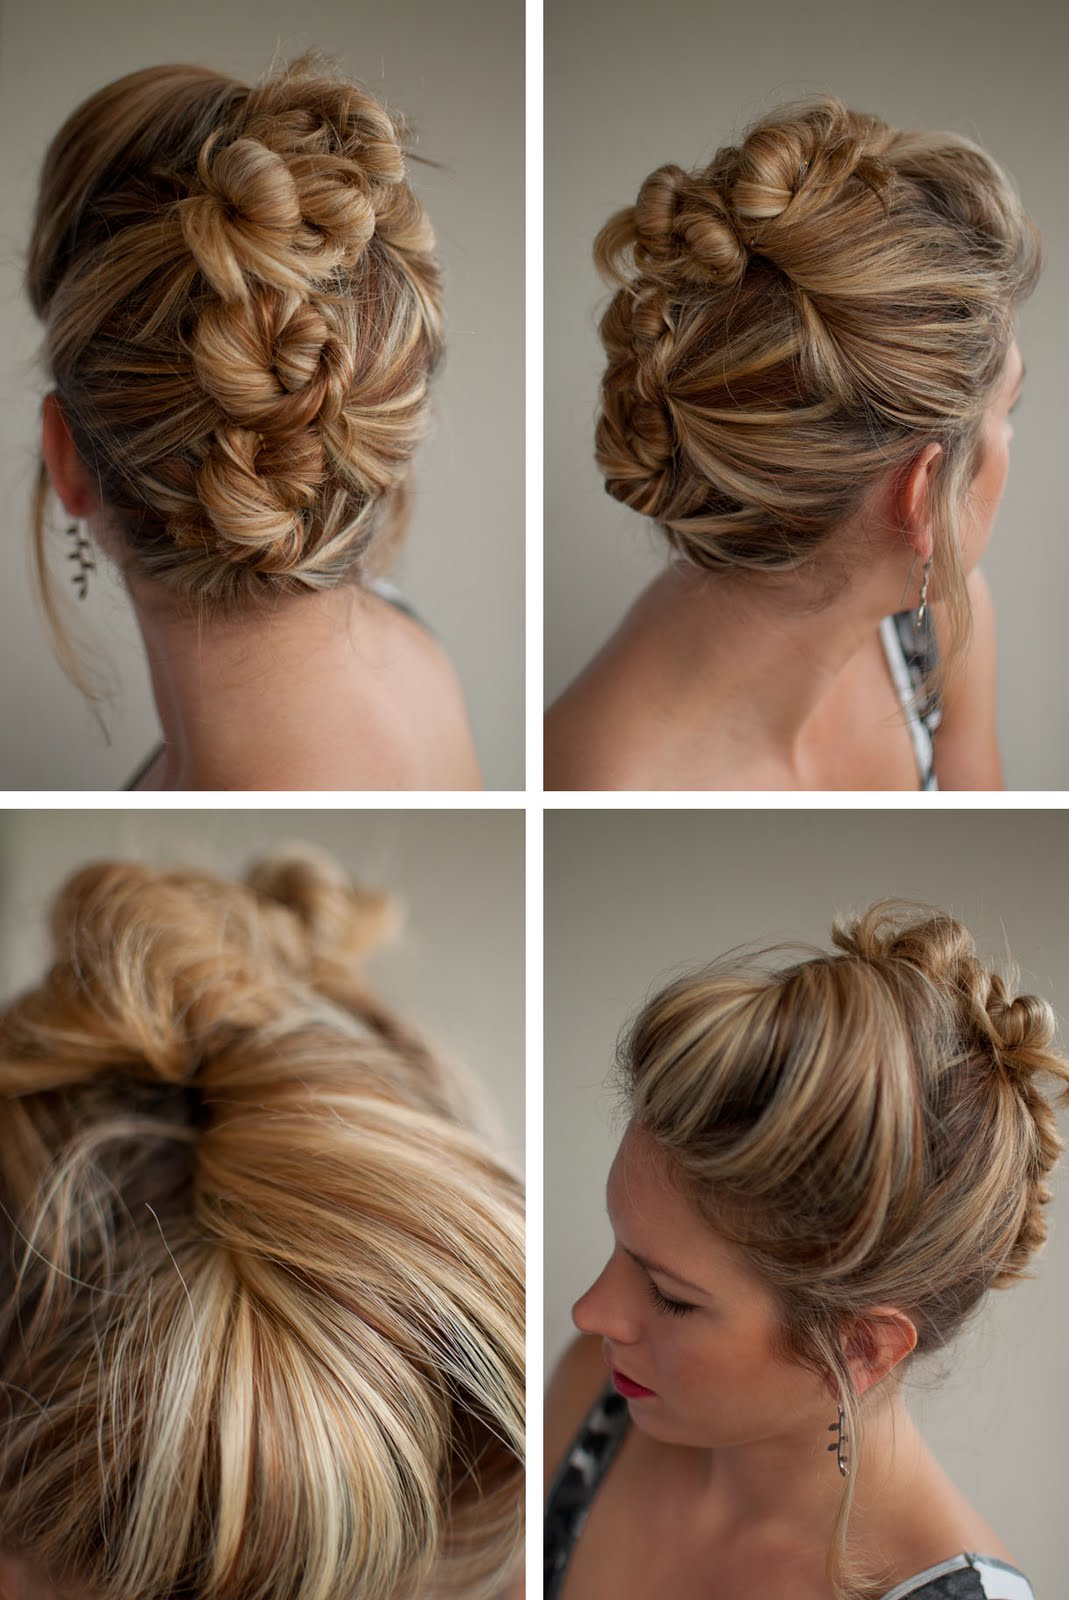 http://2.bp.blogspot.com/-4I9EX_MIZog/TcTe3y03ttI/AAAAAAAAAVQ/pO4wRe7ZqdY/s1600/bun+mohawk+hairstyle+collage.jpg